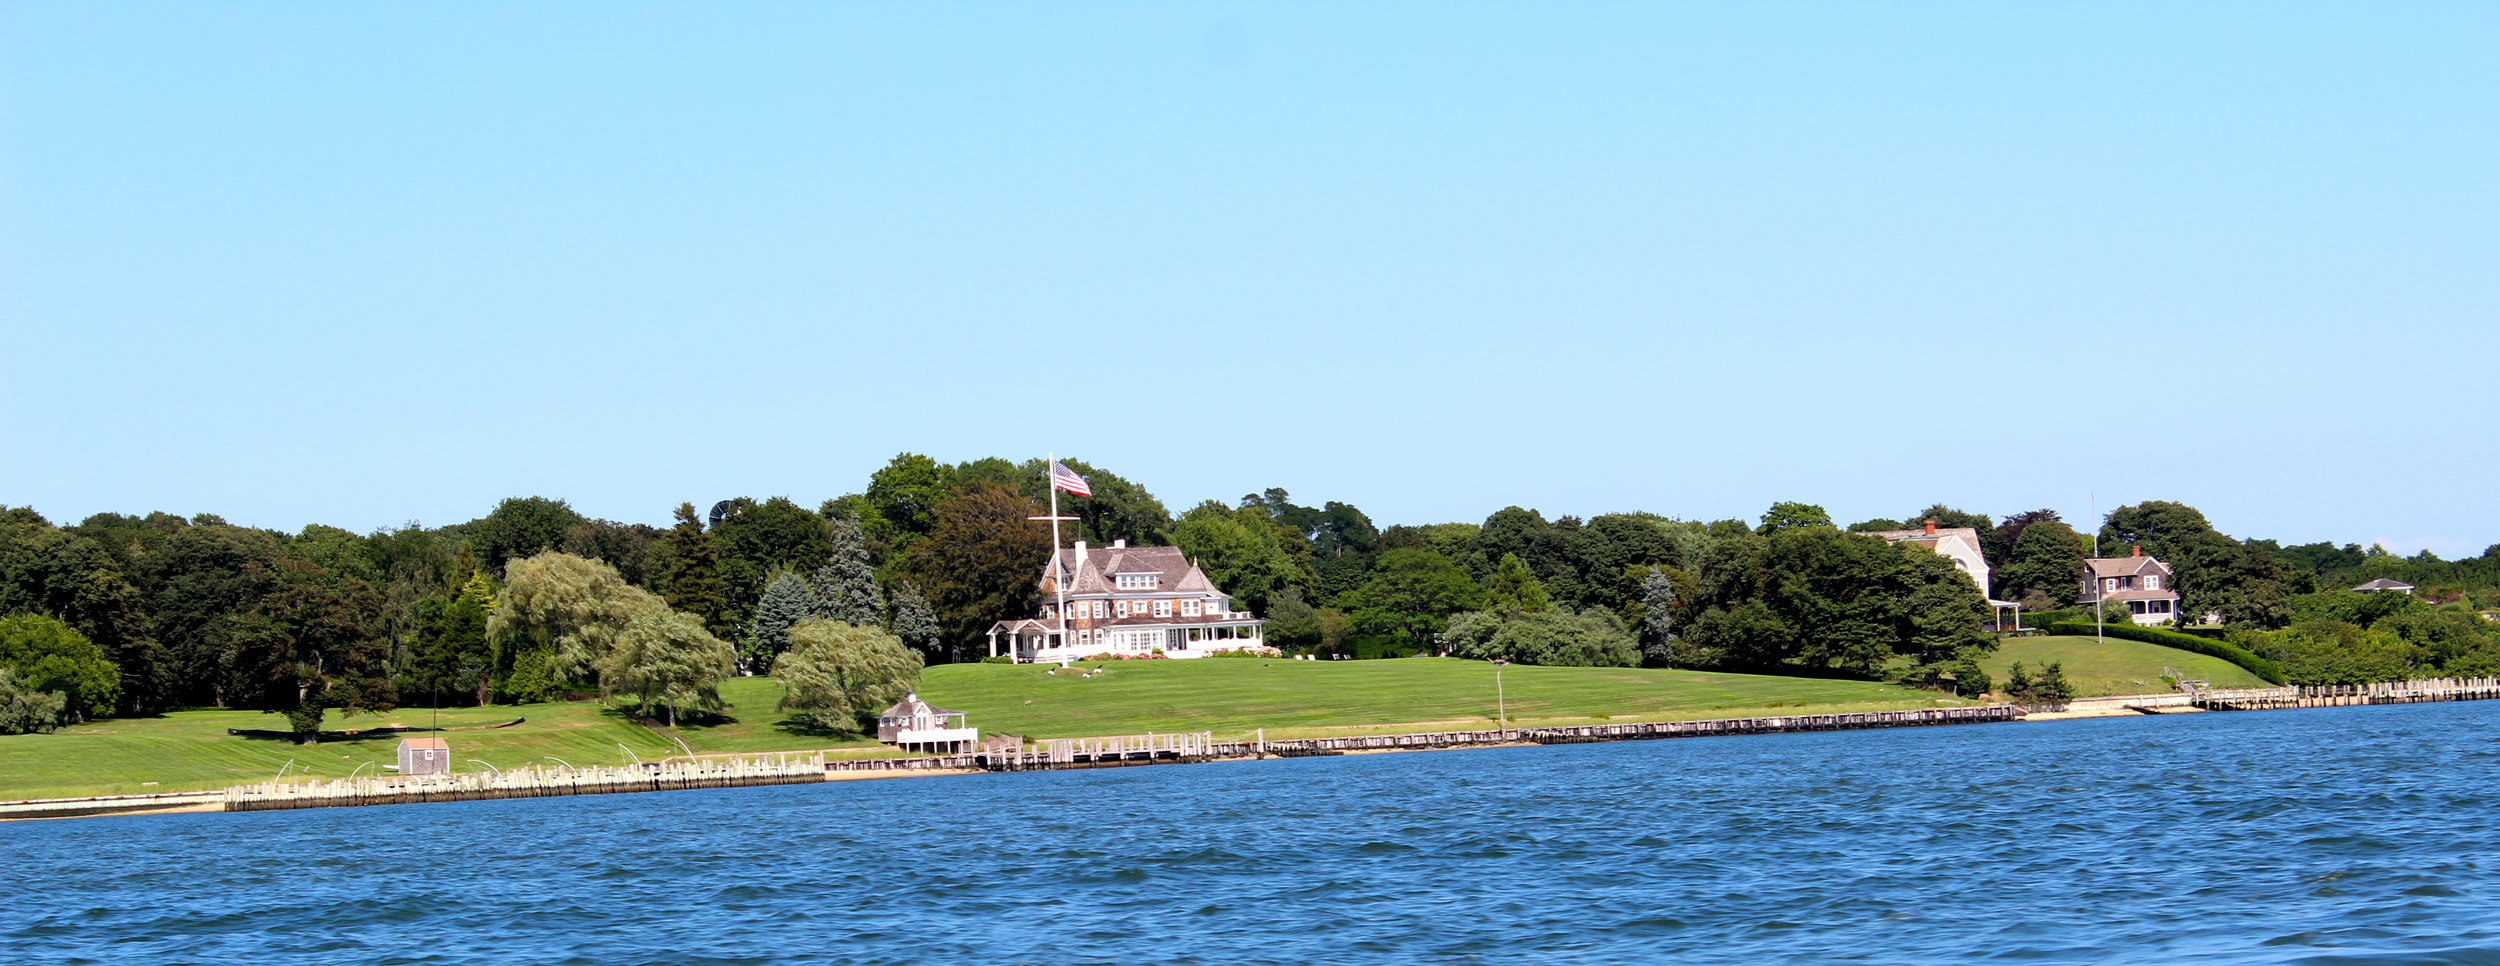 Shelter Island Hamptons Long Island East Hampton USA